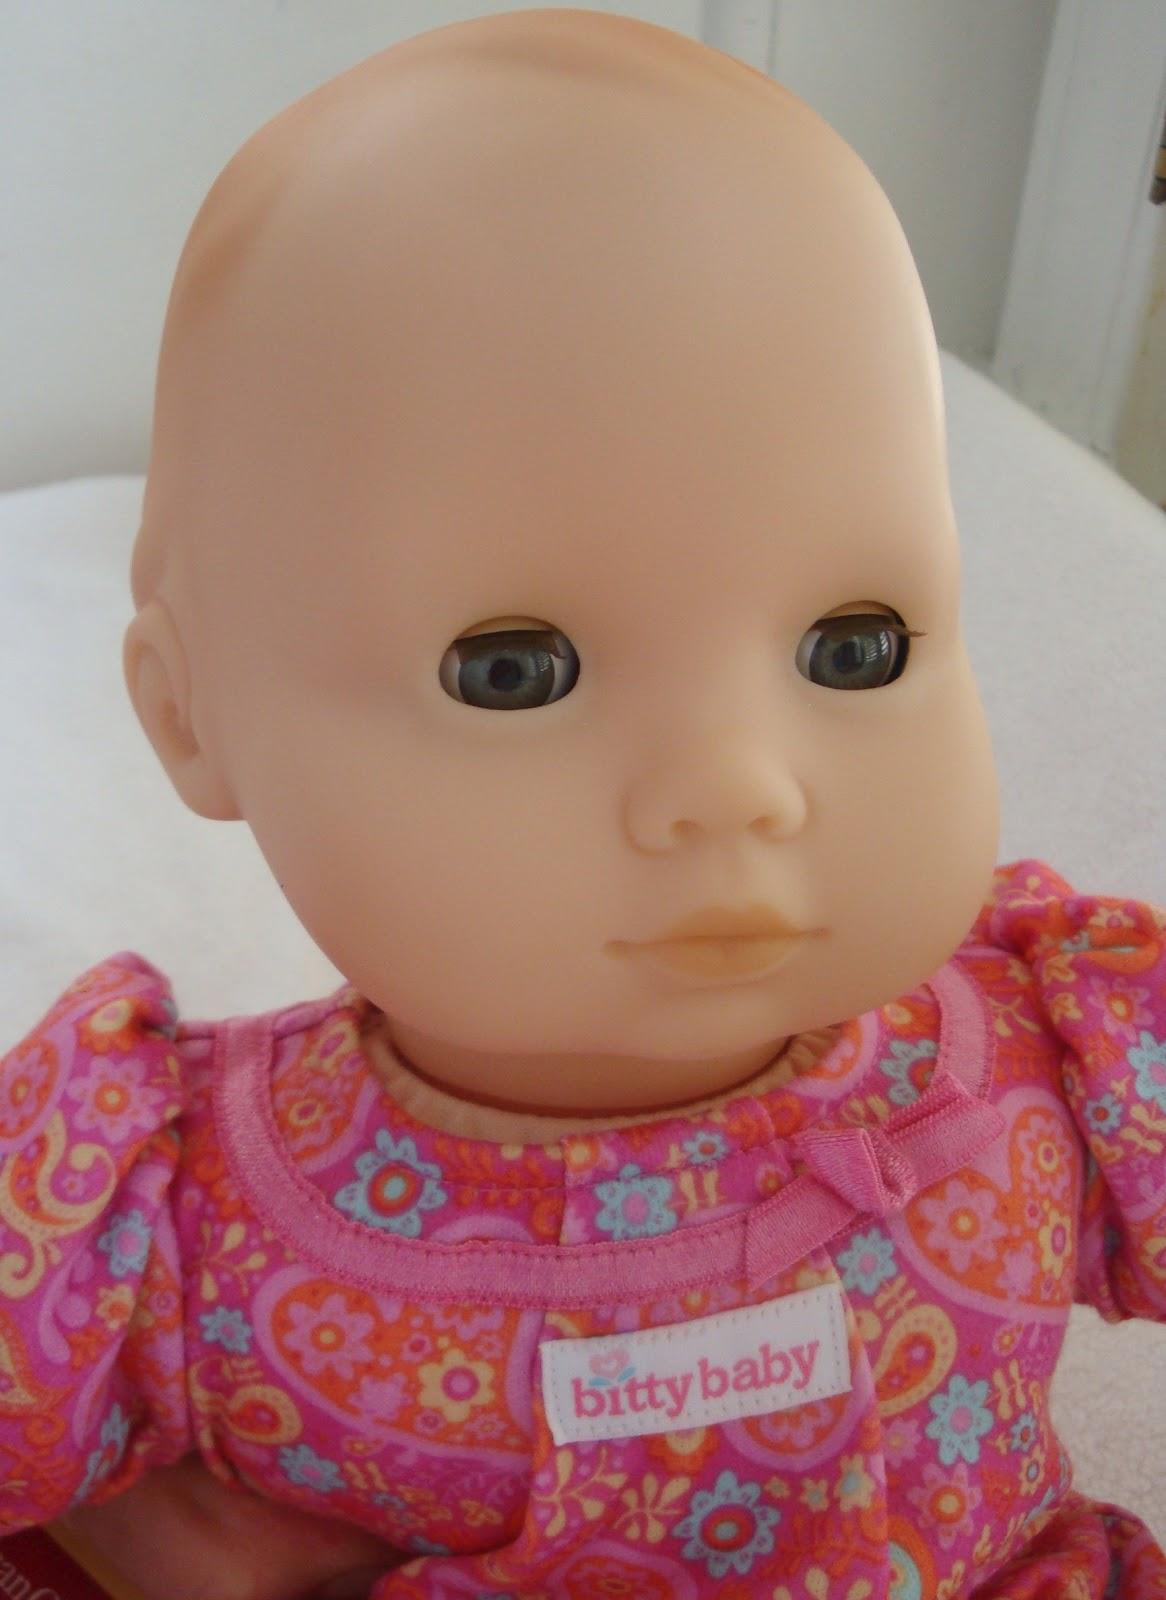 Mamazakka Toy Review American Girl Dolls Vs Corolle Dolls